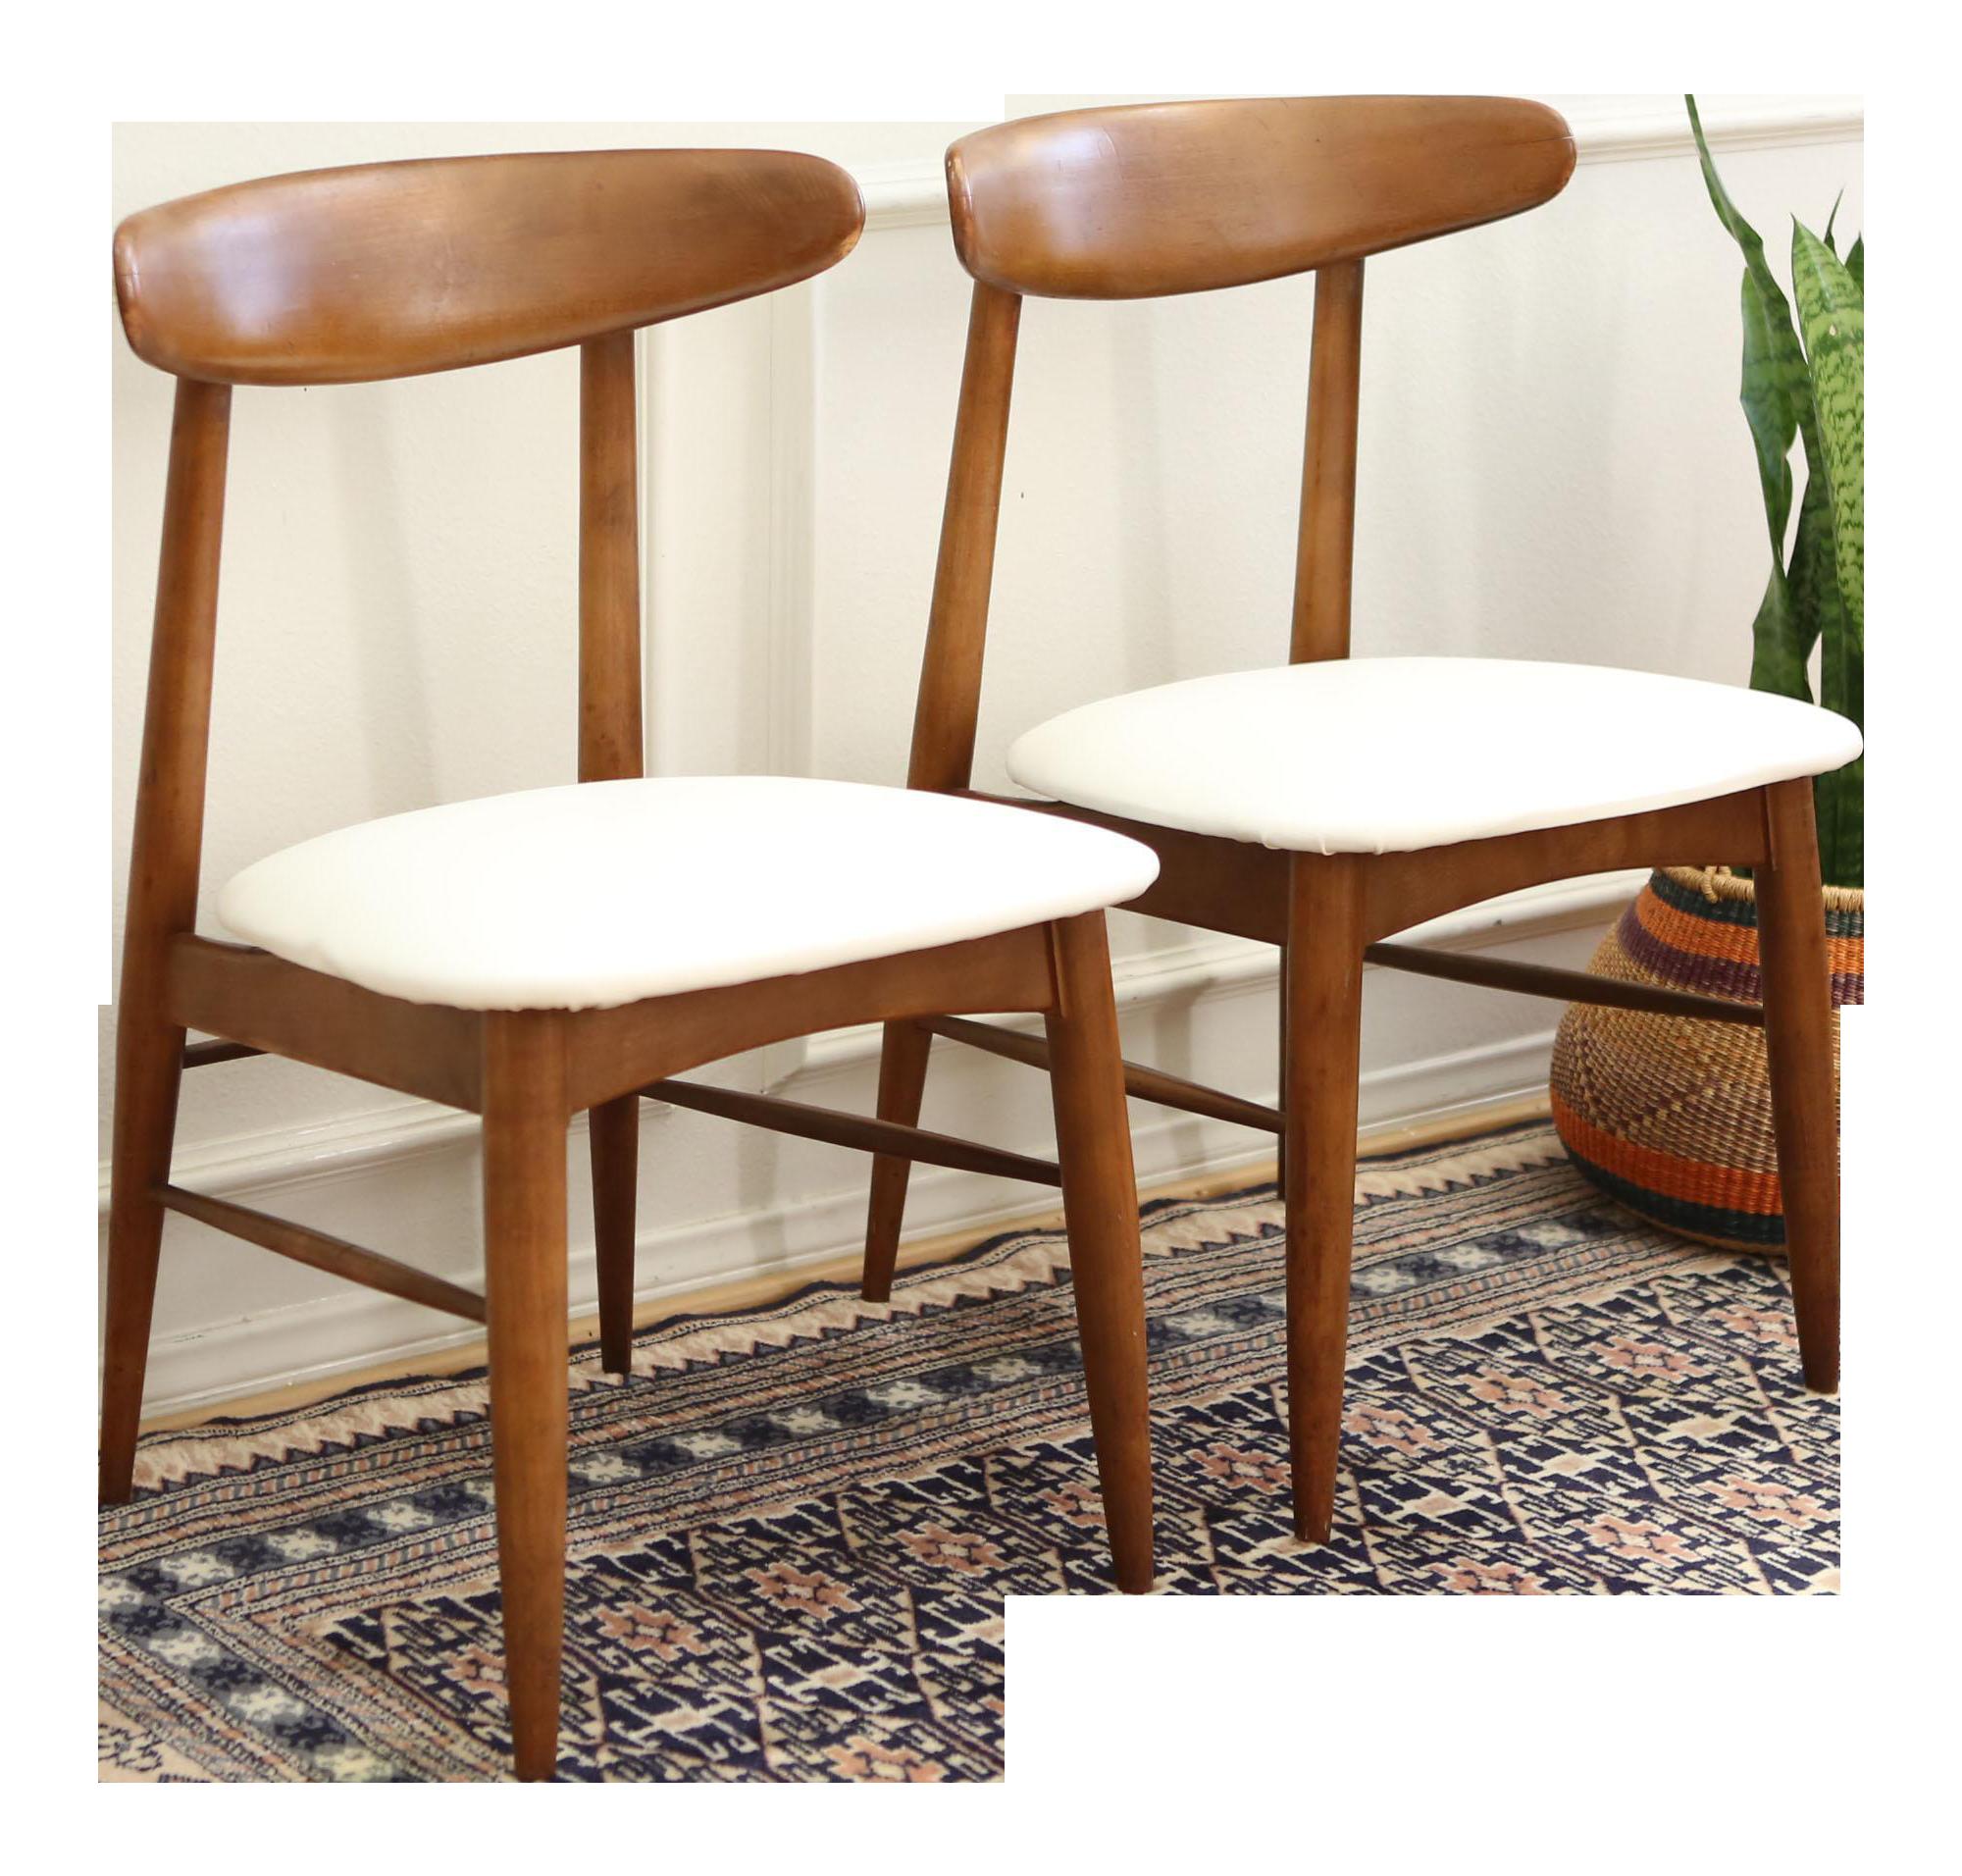 Vintage Mid Century Modern Scandia Danish Teak Chair Pair Chairish